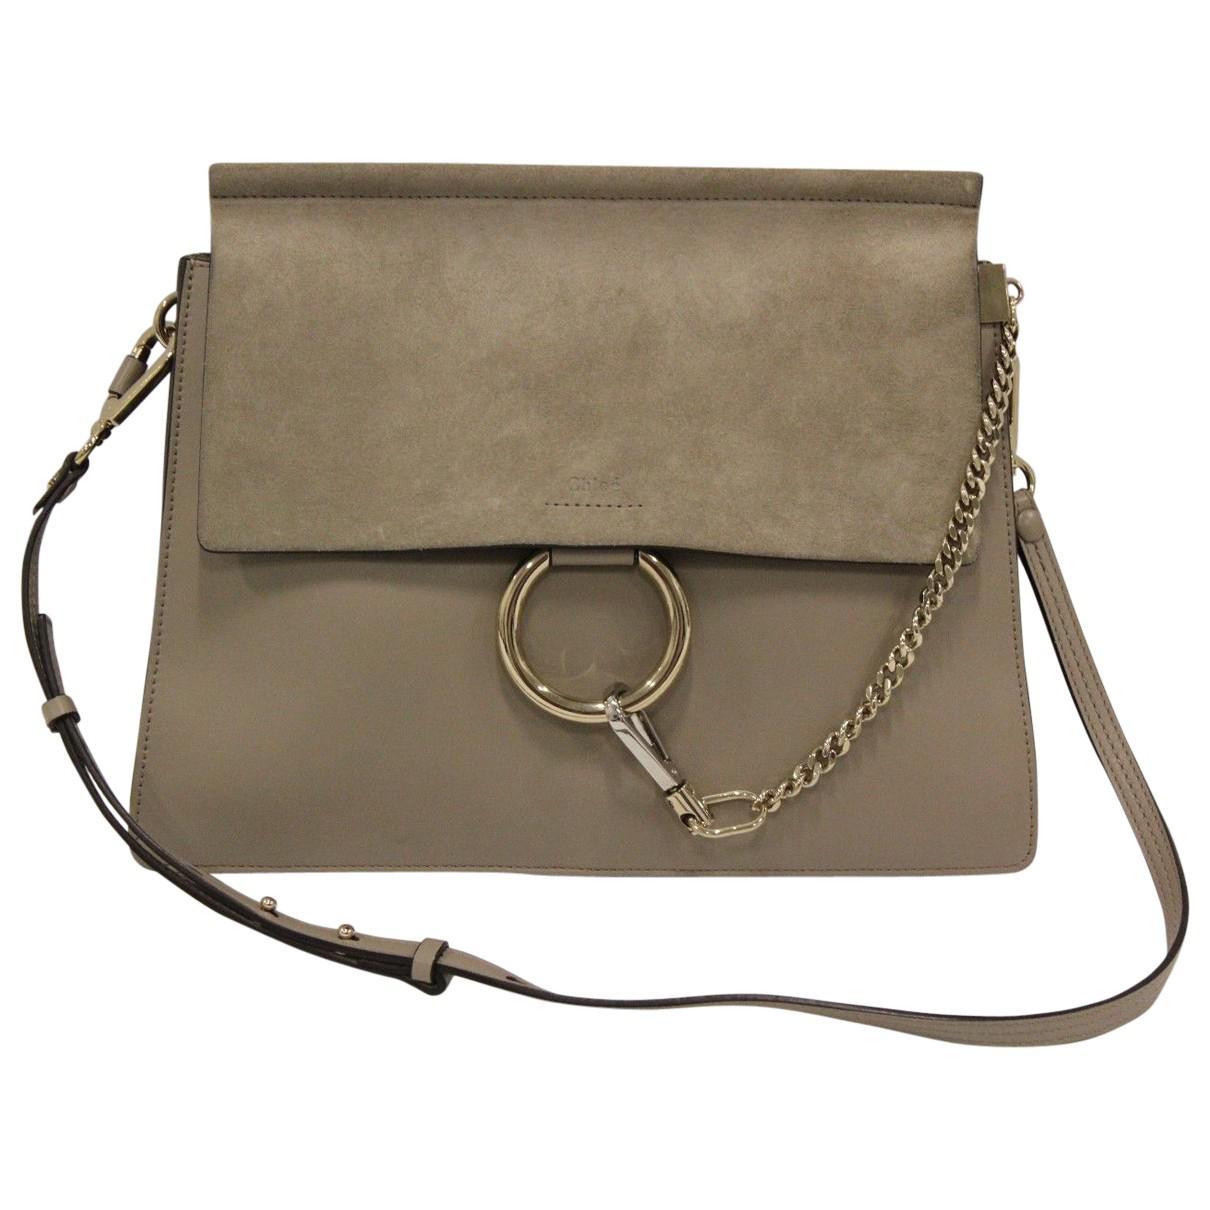 Pre-owned - Faye leather handbag Chlo eh2eHNN